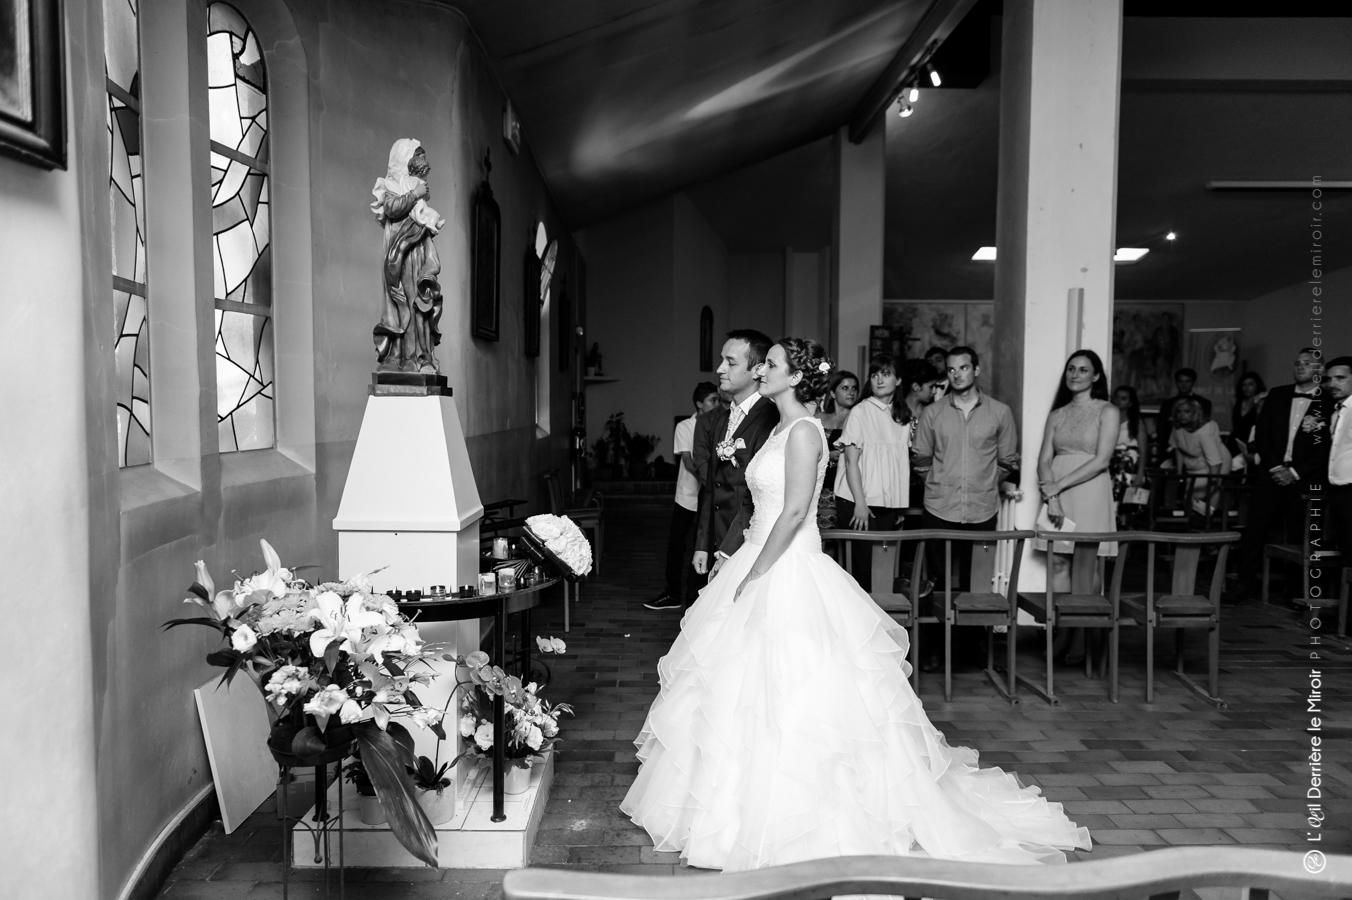 mariage-cj-vaugrenier-loeilderrierelemiroir-044